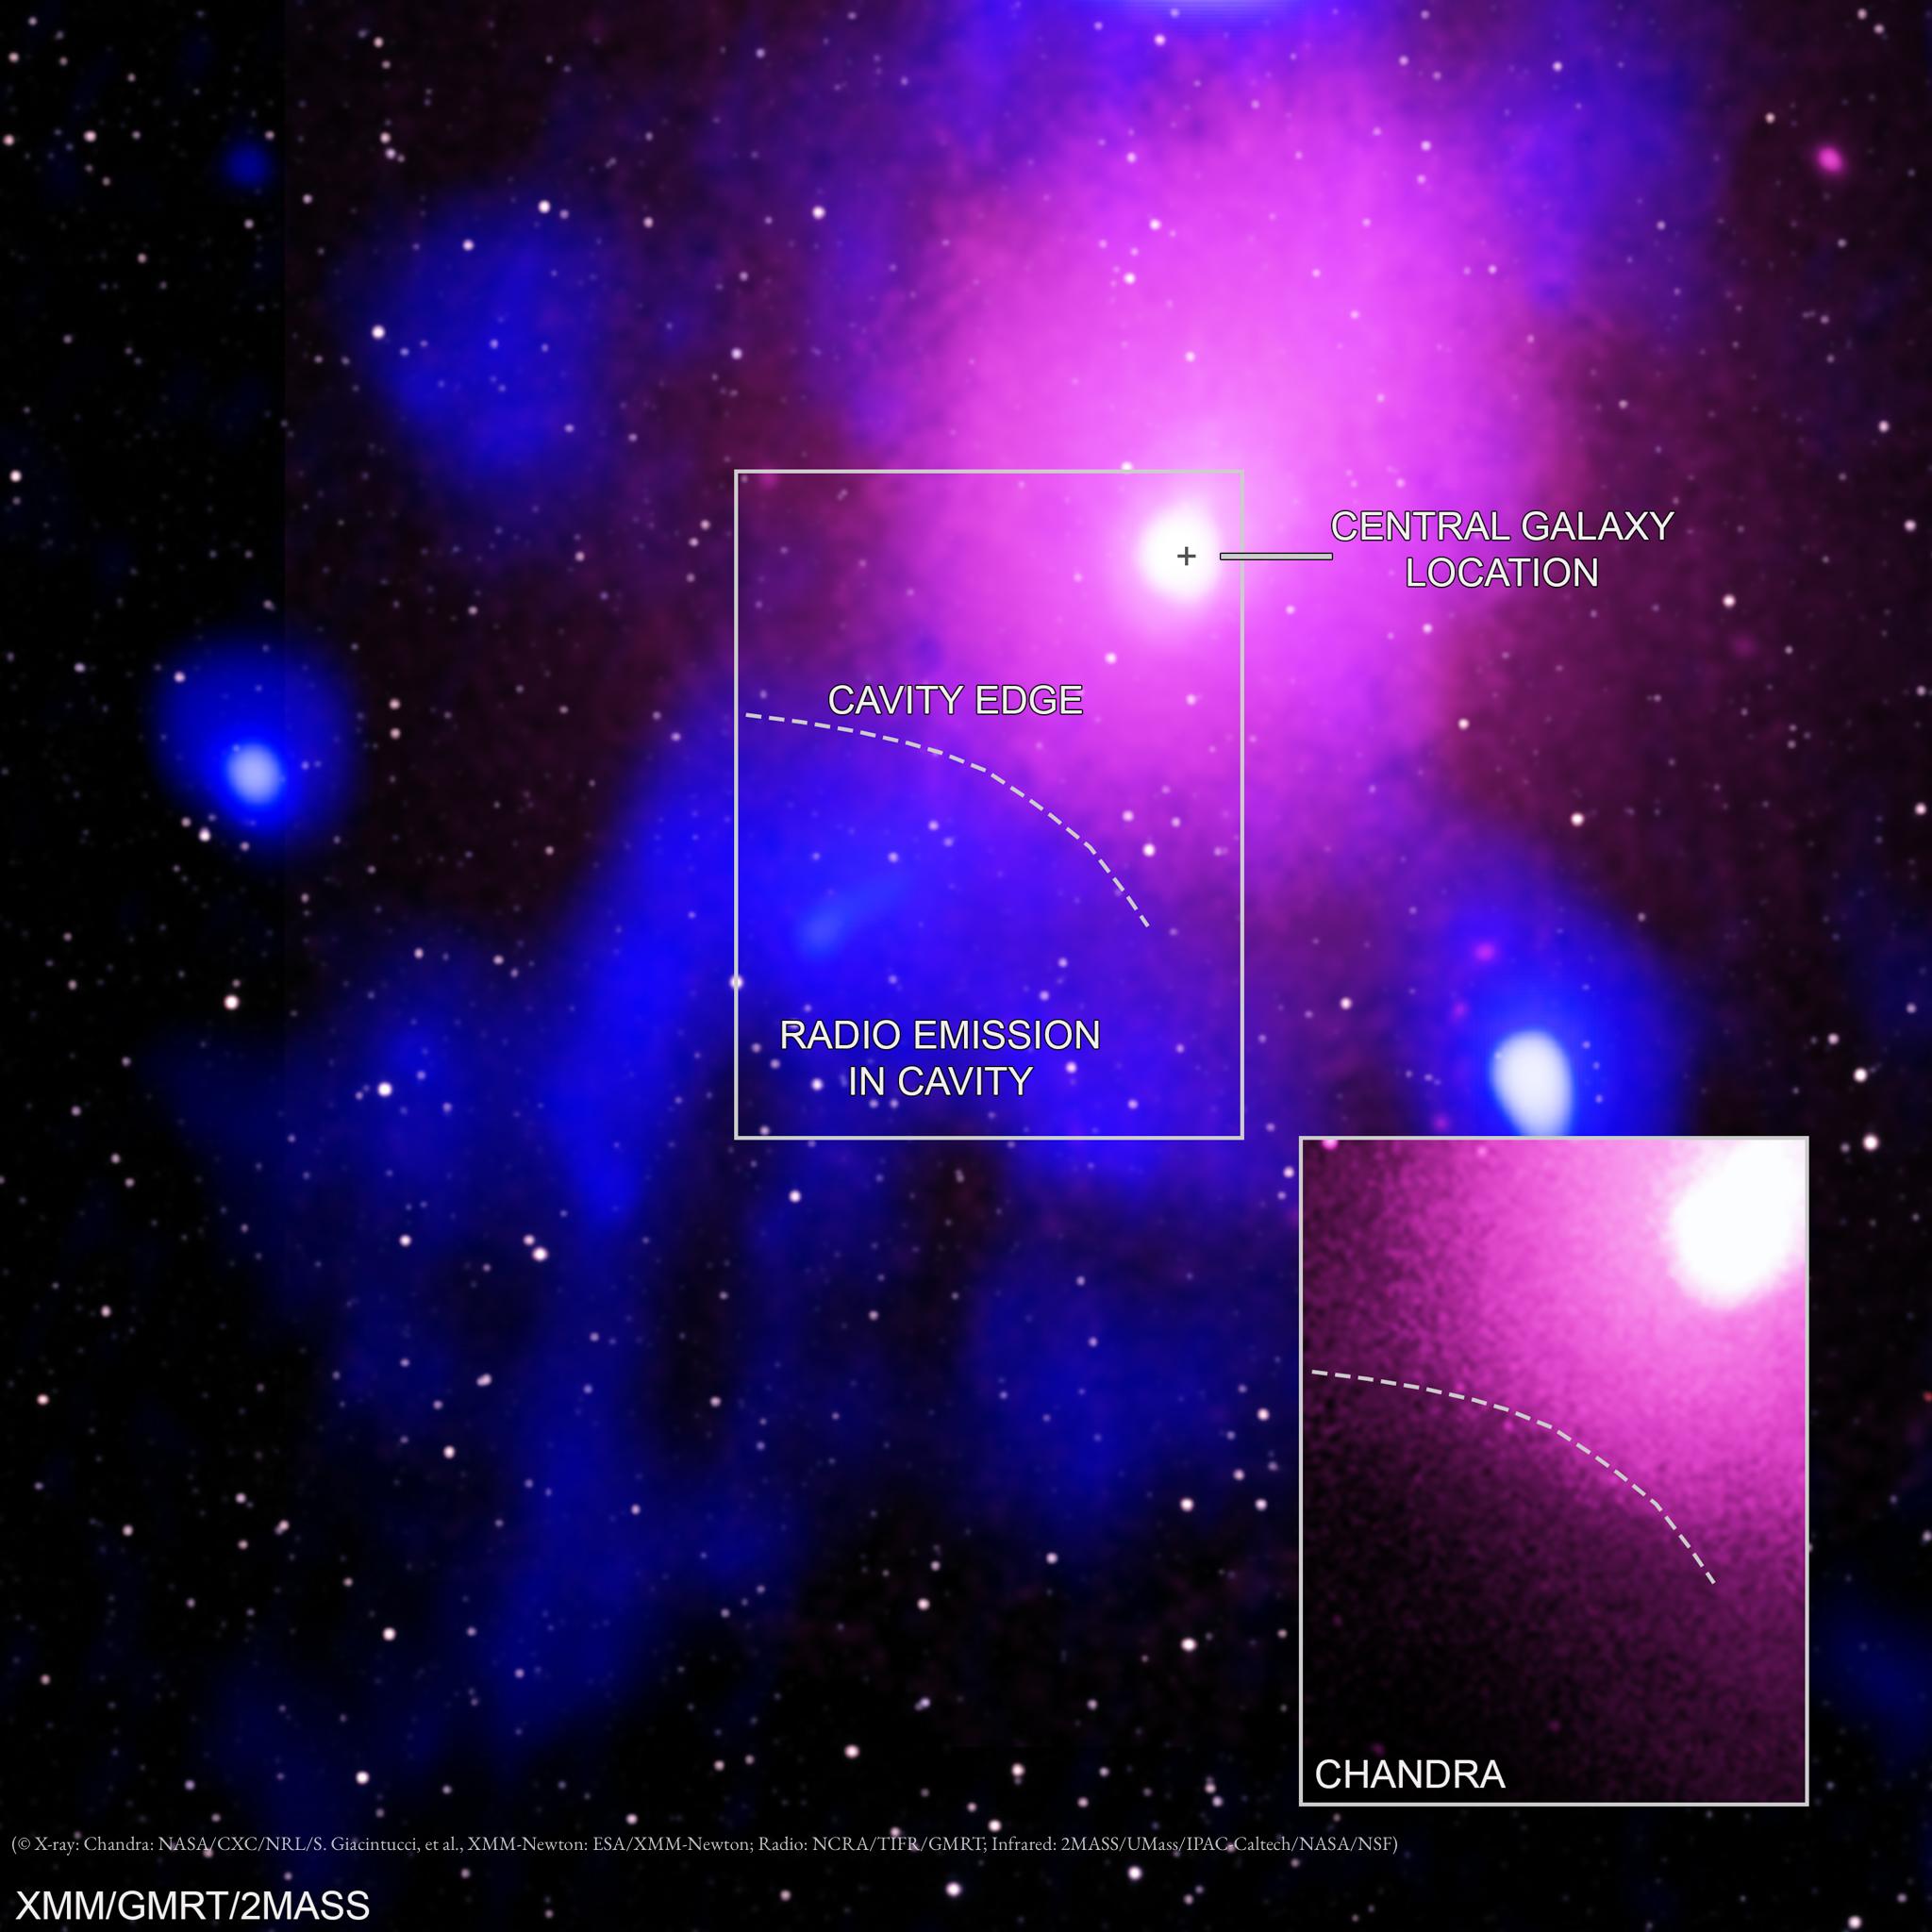 Image astronomique montrant des émissions en rayons X, radio et infrarouge (© X-ray : Chandra : NASA/CXC/NRL/S. Giacintucci, et al., XMM-Newton : ESA/XMM-Newton ; Radio : NCRA/TIFR/GMRT ; Infrared : 2MASS/UMass/IPAC-Caltech/NASA/NSF)